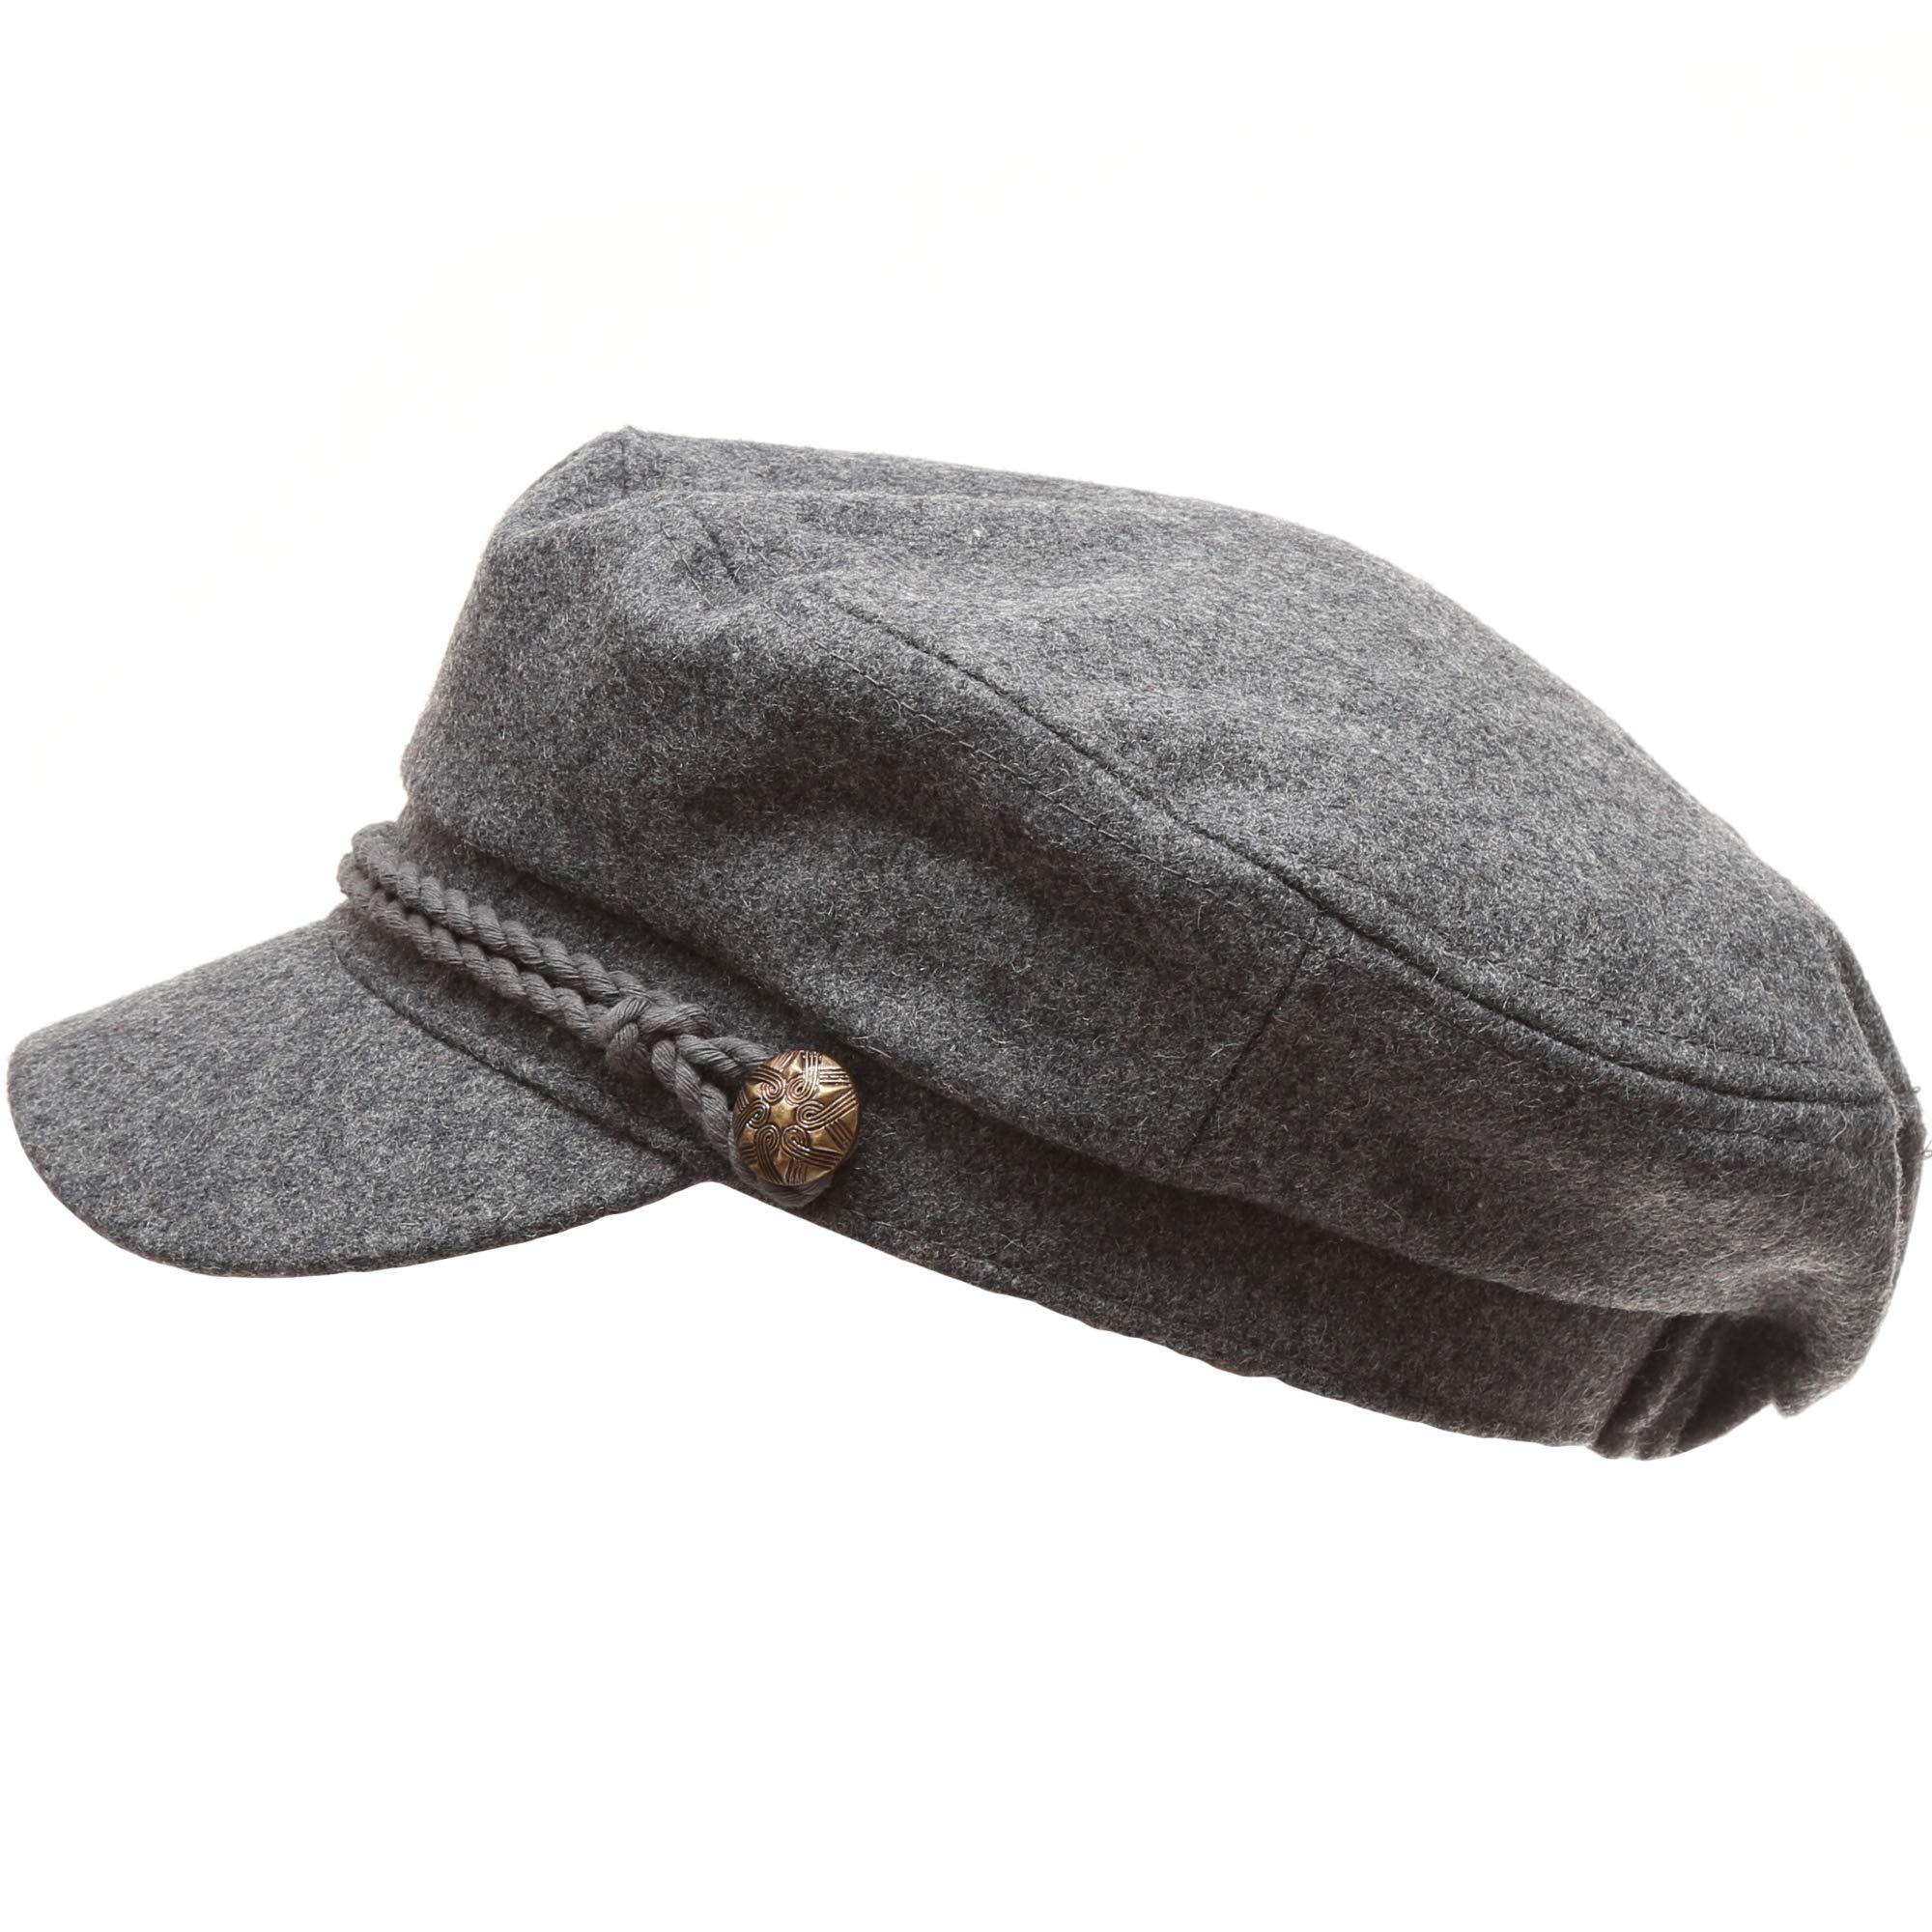 MIRMARU Women's Classic Mariner Style Greek Fisherman's Sailor Newsboy Hats with Comfort Elastic Back (3034 Charcoal)